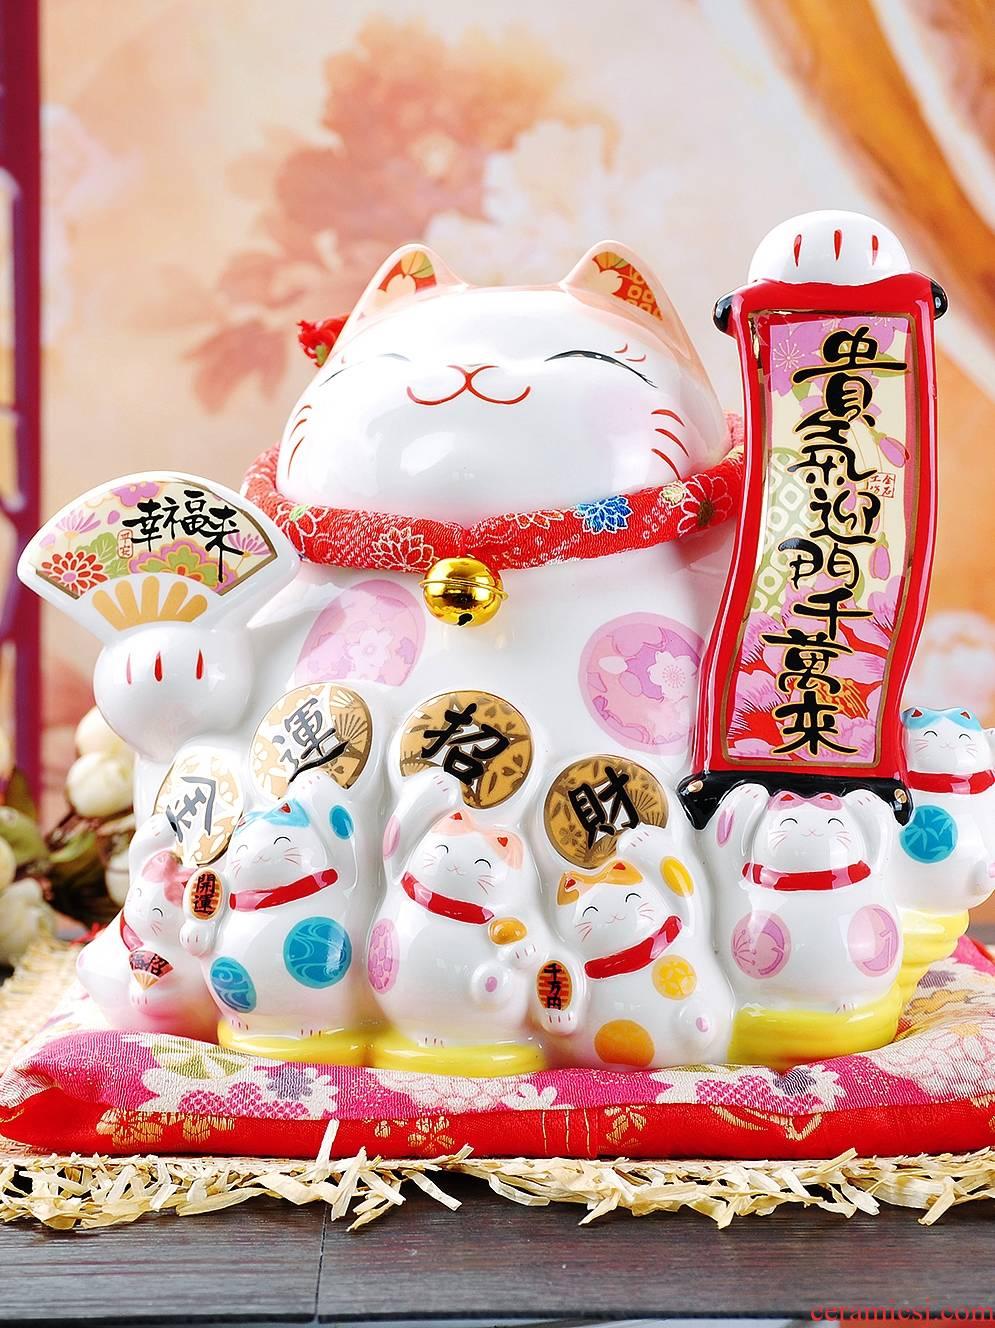 Stone workshop opening gifts creative plutus cat ceramic storage tank large Japanese store checkout furnishing articles